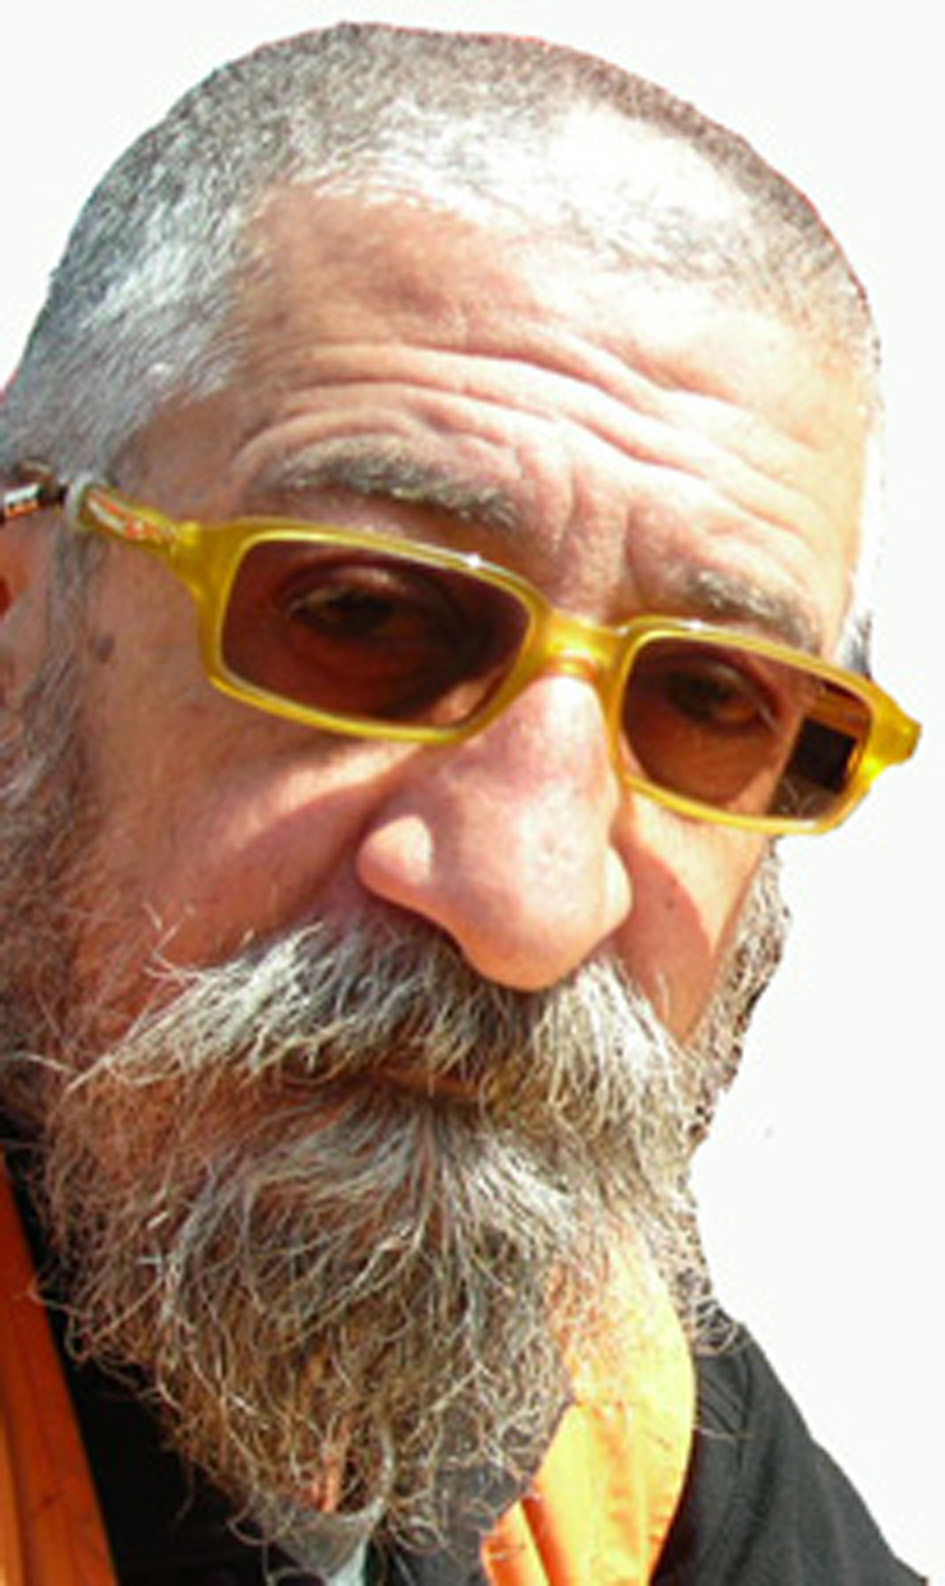 Dattolico Vito Luigi